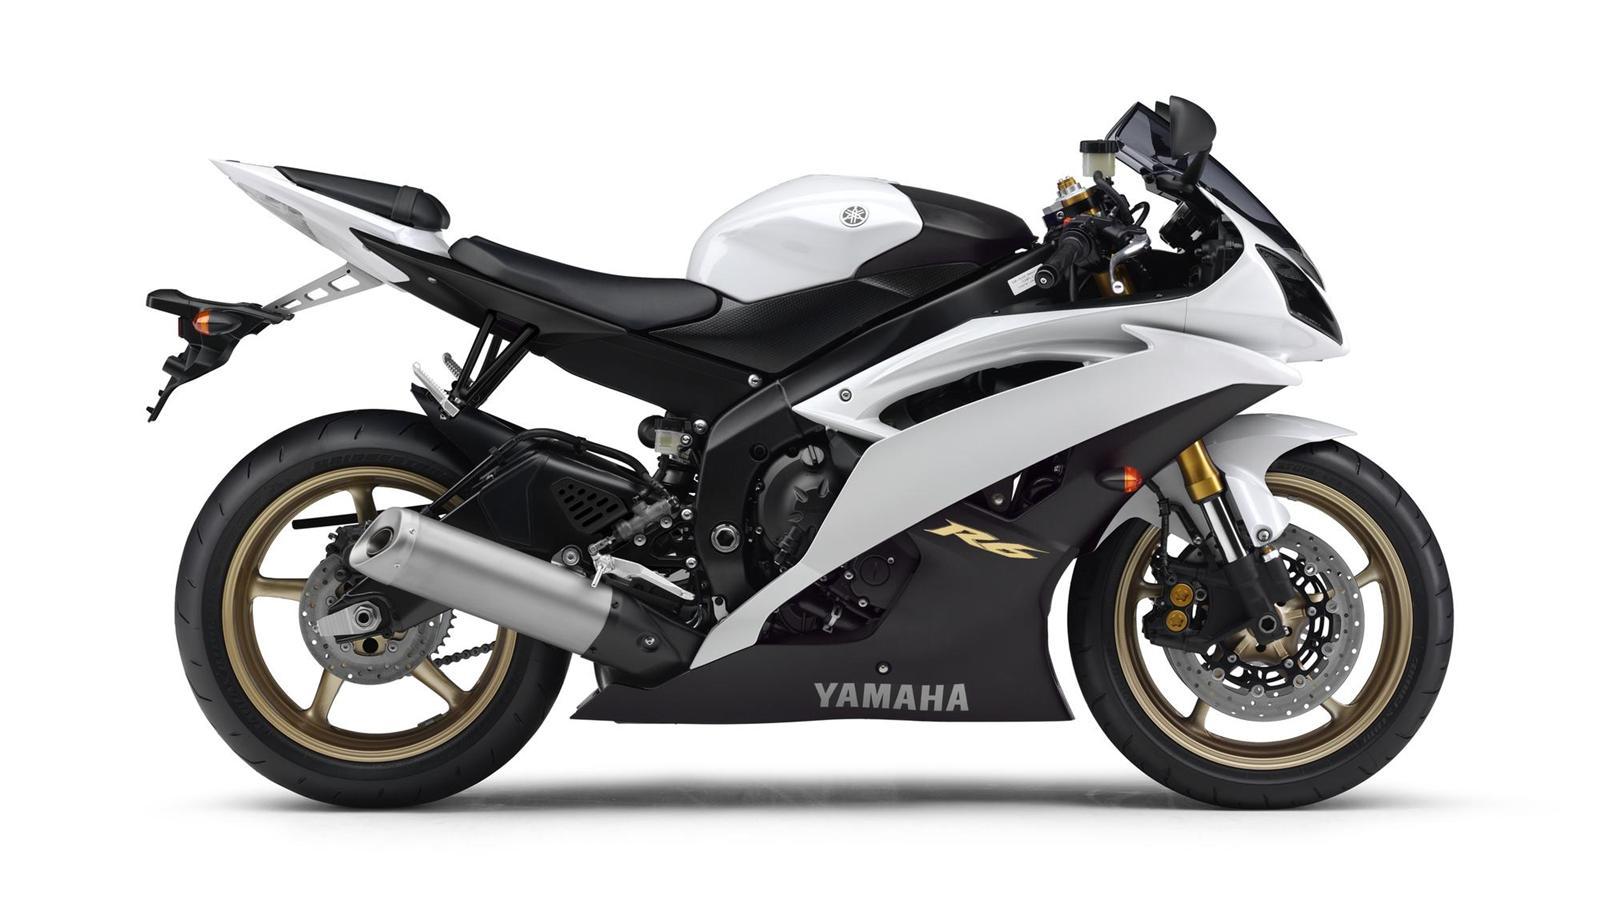 Yamaha R6 Vs Suzuki Gsxr 600 - Motorcycle Wallpaper